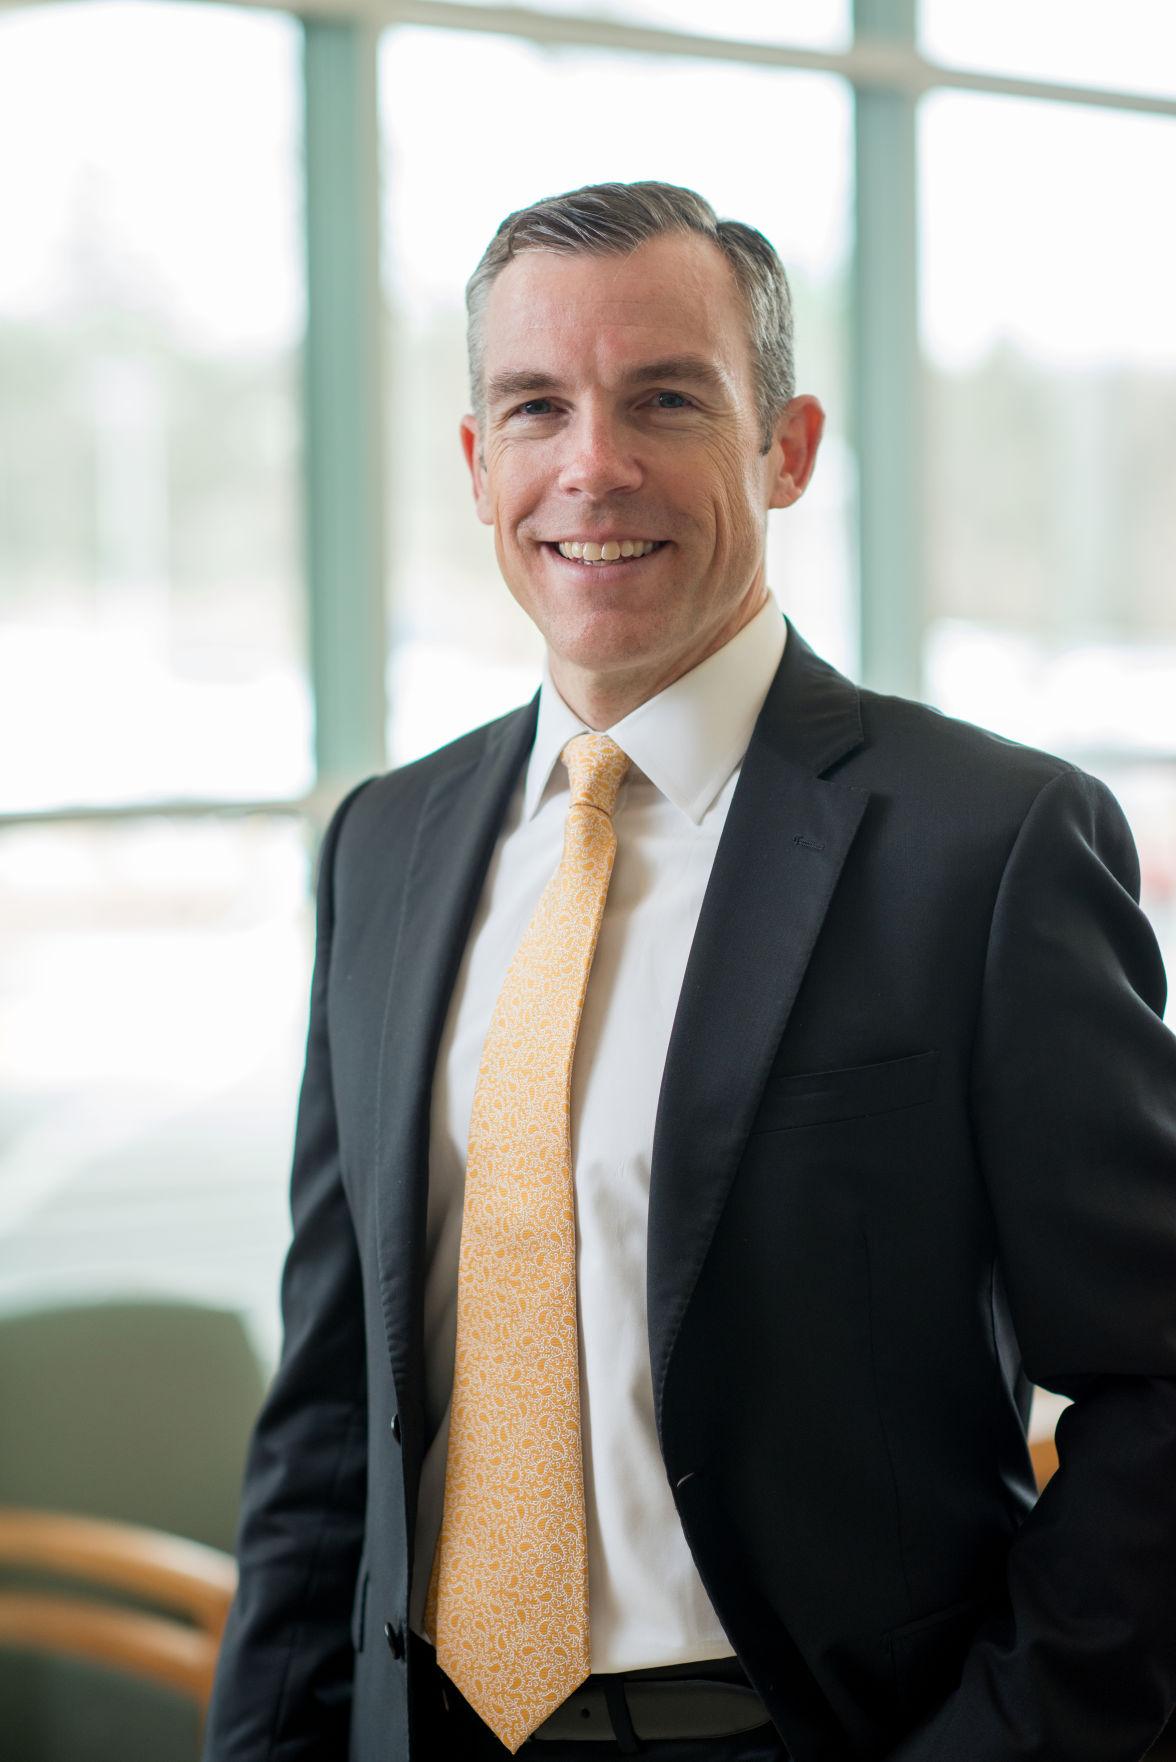 CEO Chad Melton